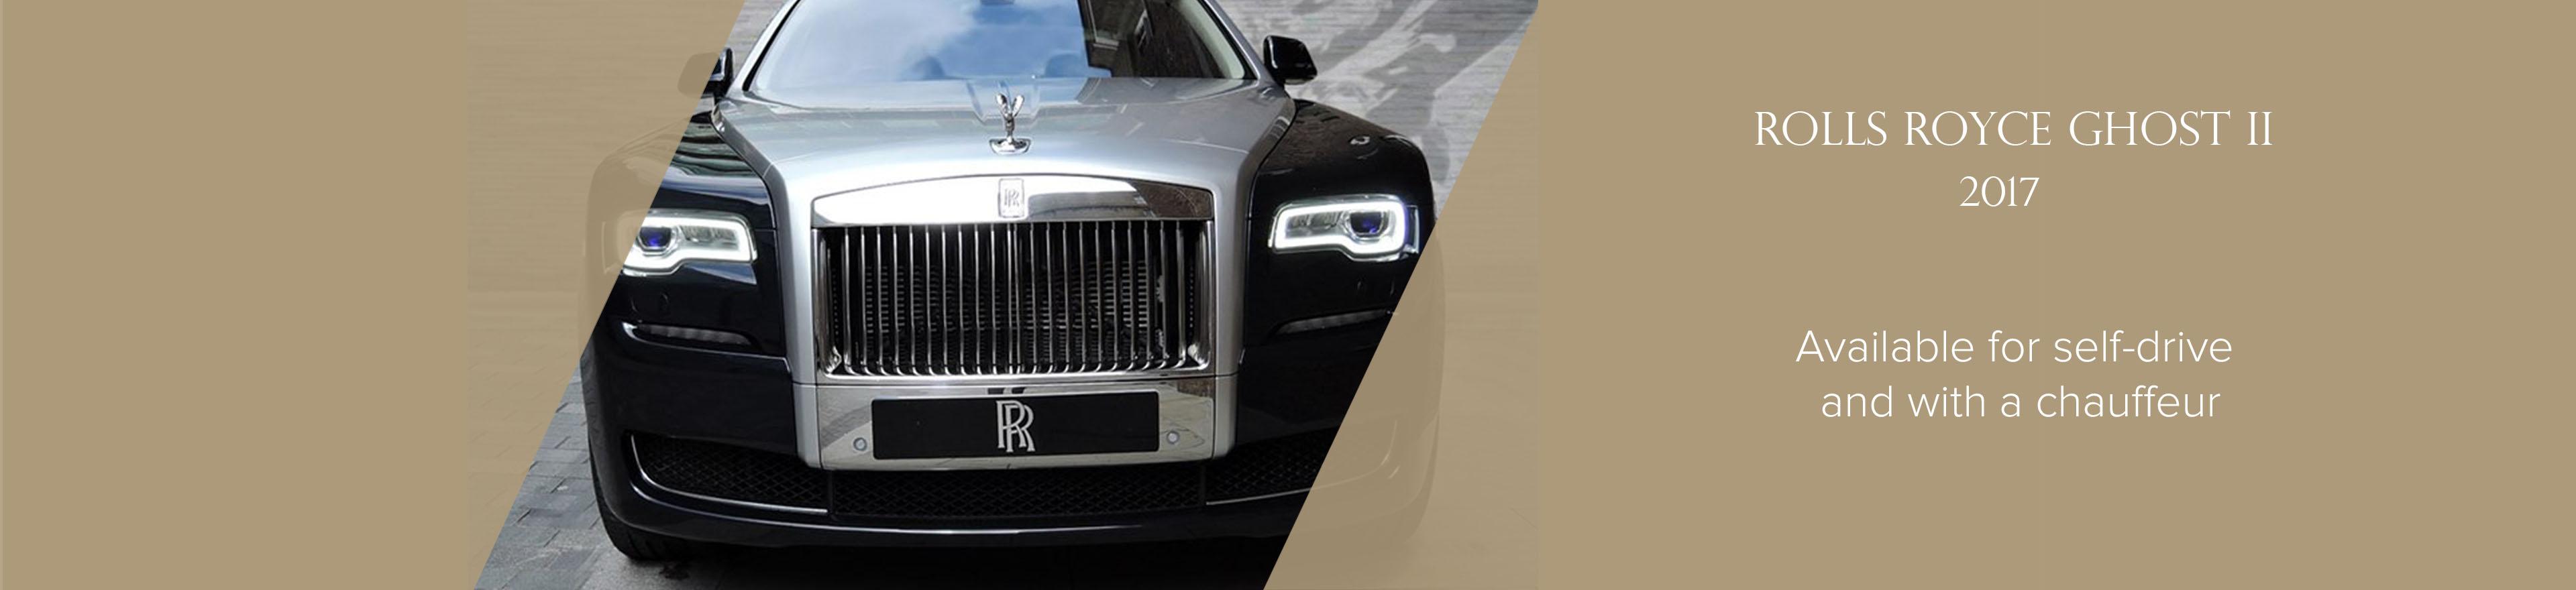 Rolls Royce Hire